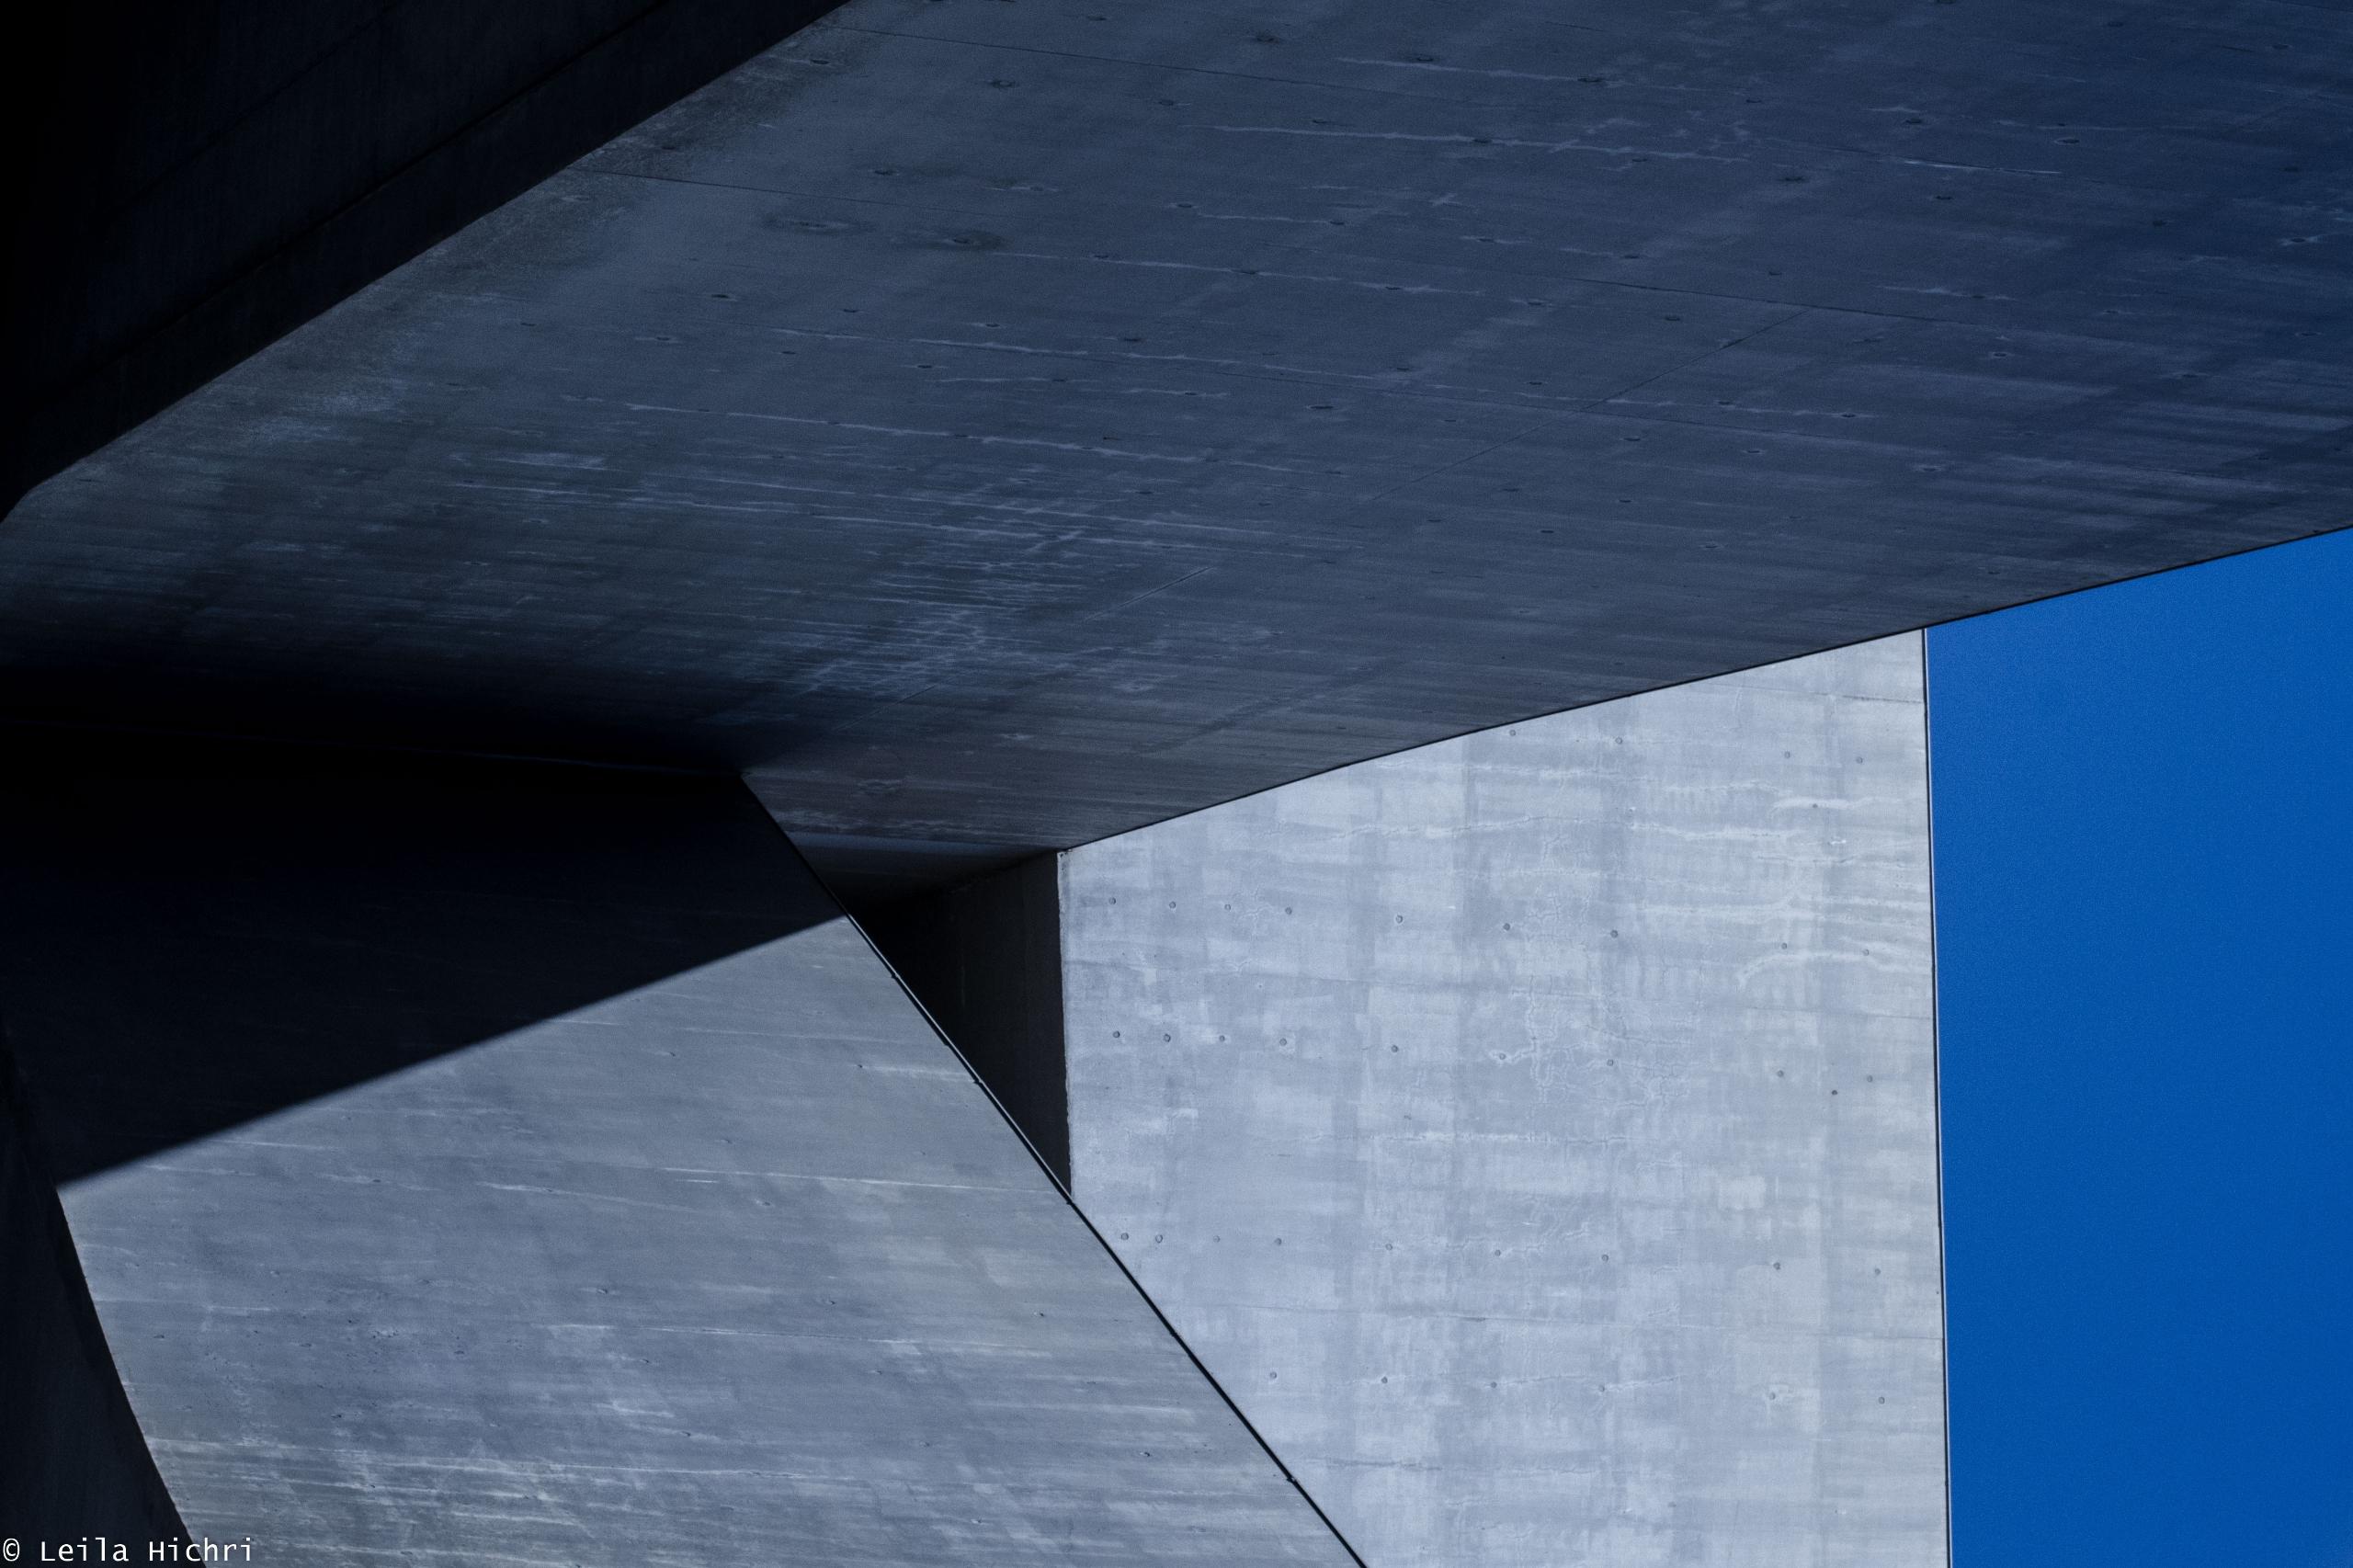 shapes, architecture, shadows - trollina14   ello